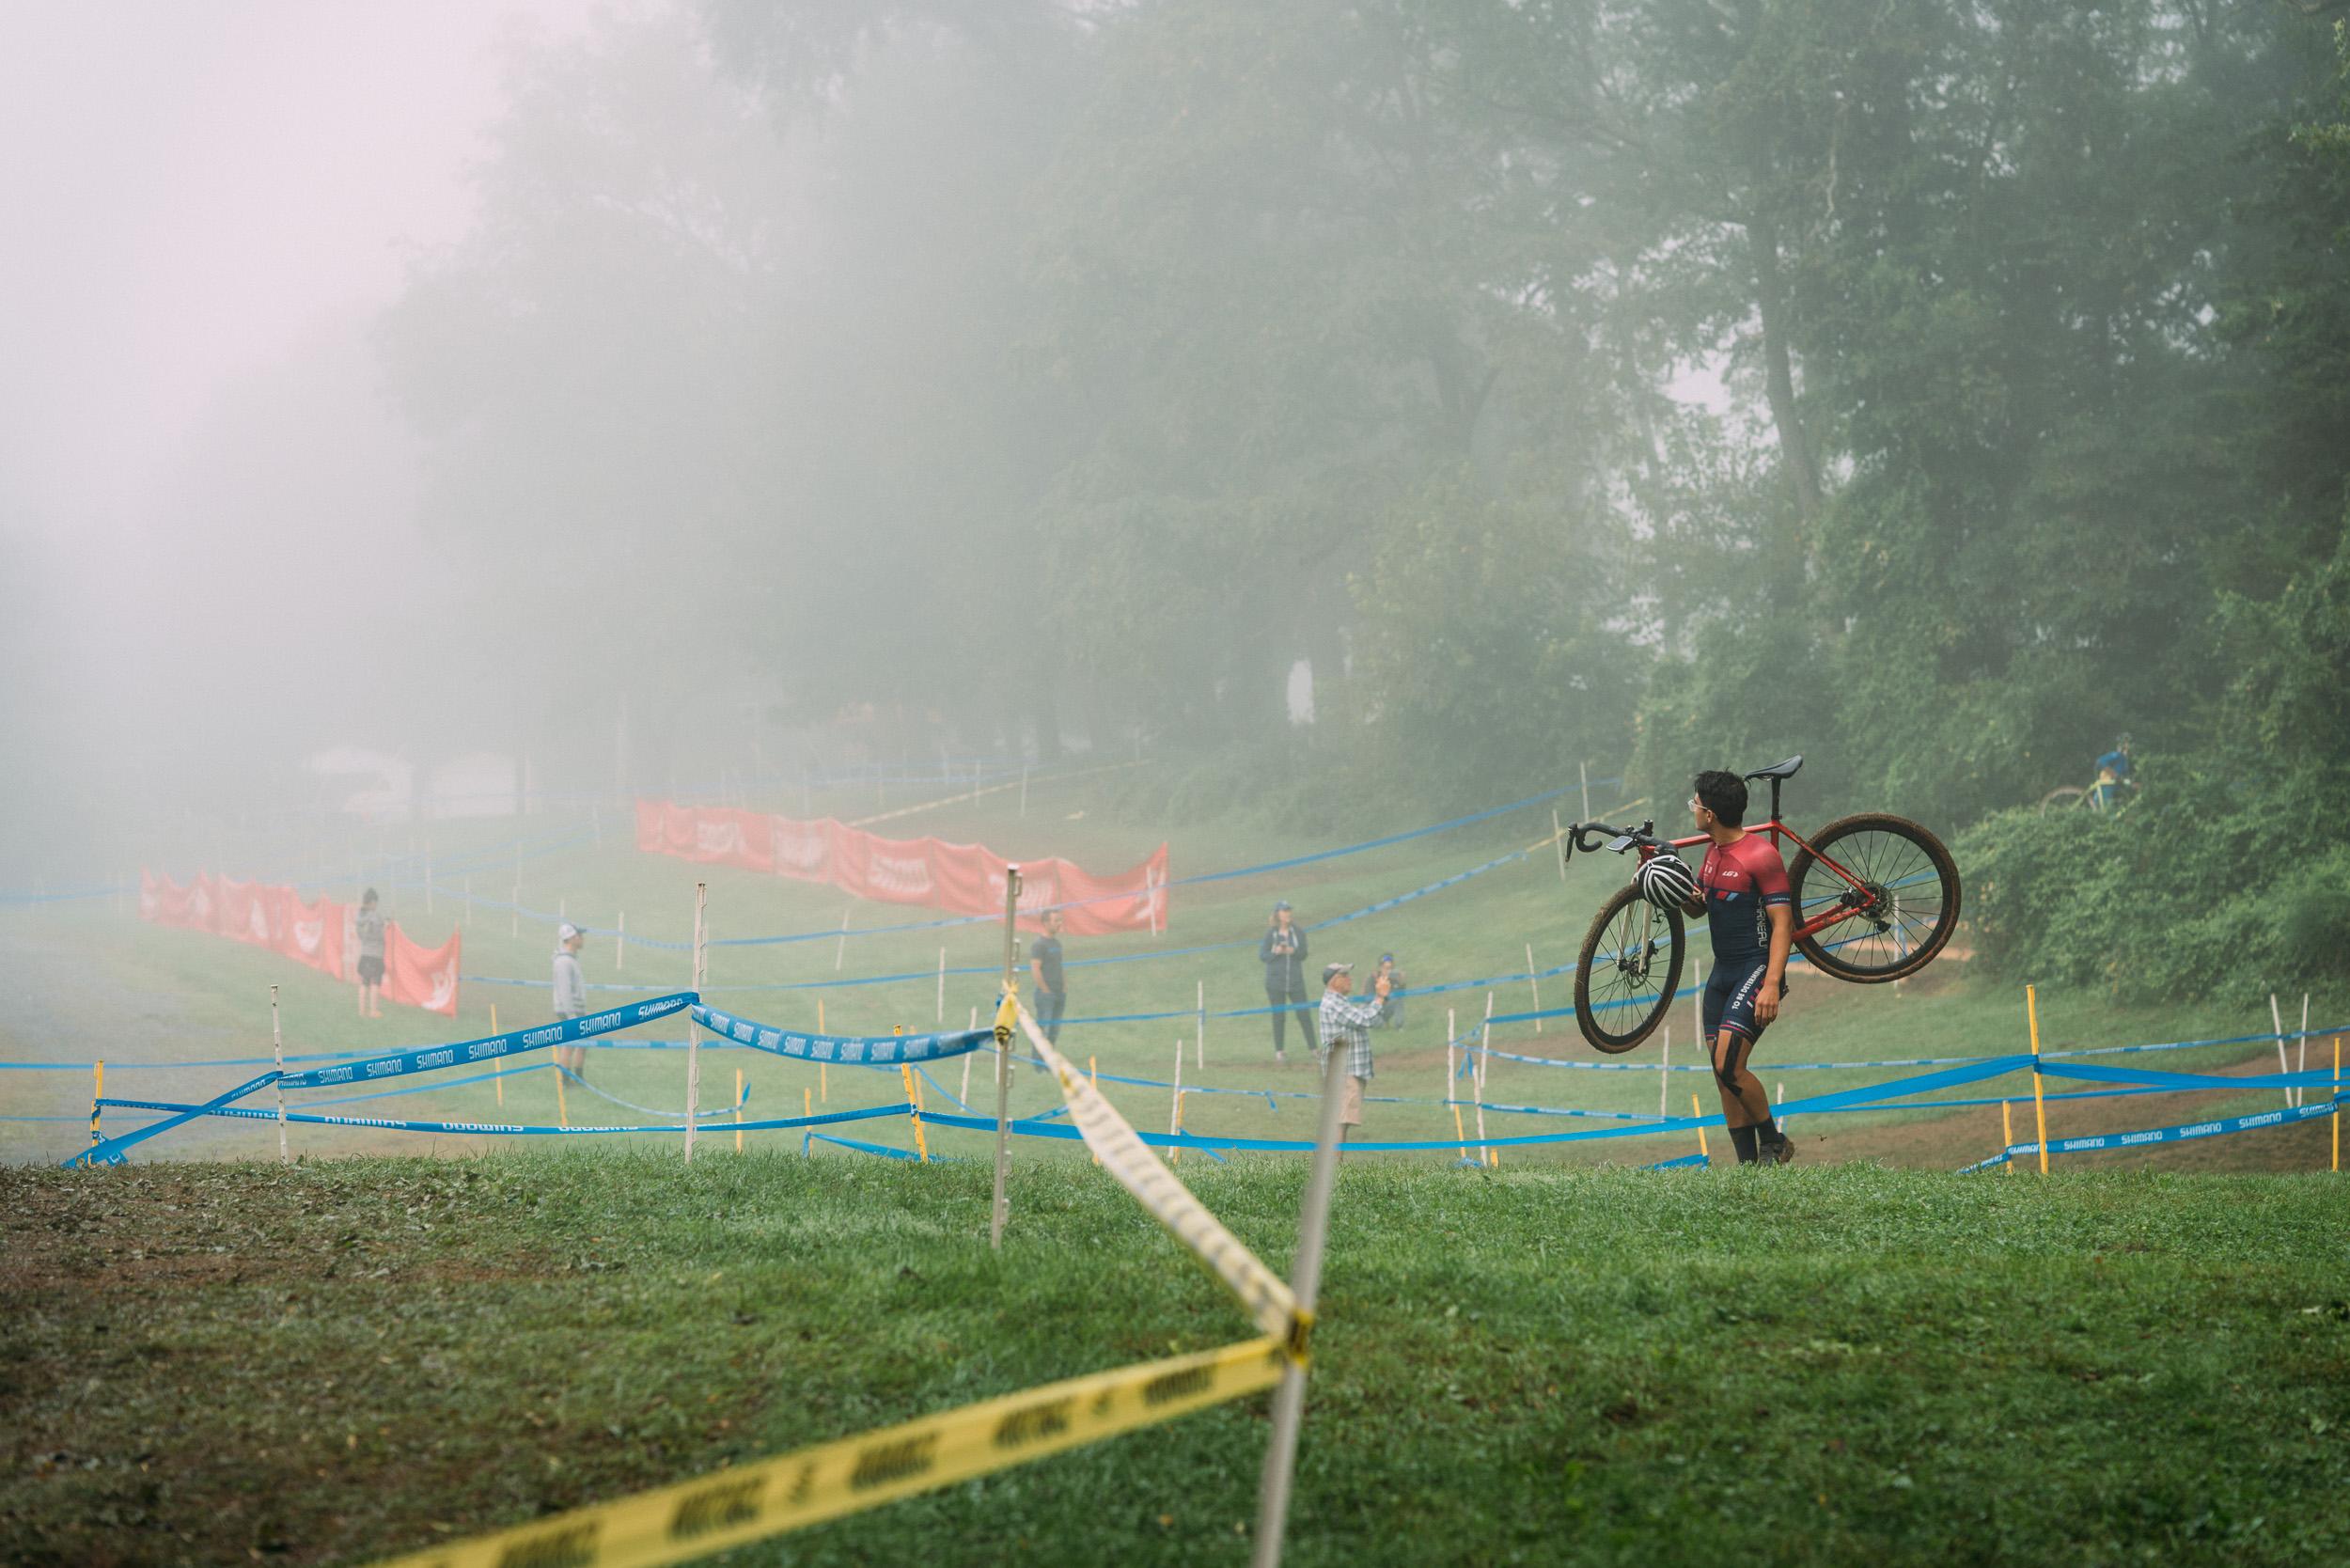 photo-rhetoric-to-be-determined-nittany-cyclocross-1244.jpg